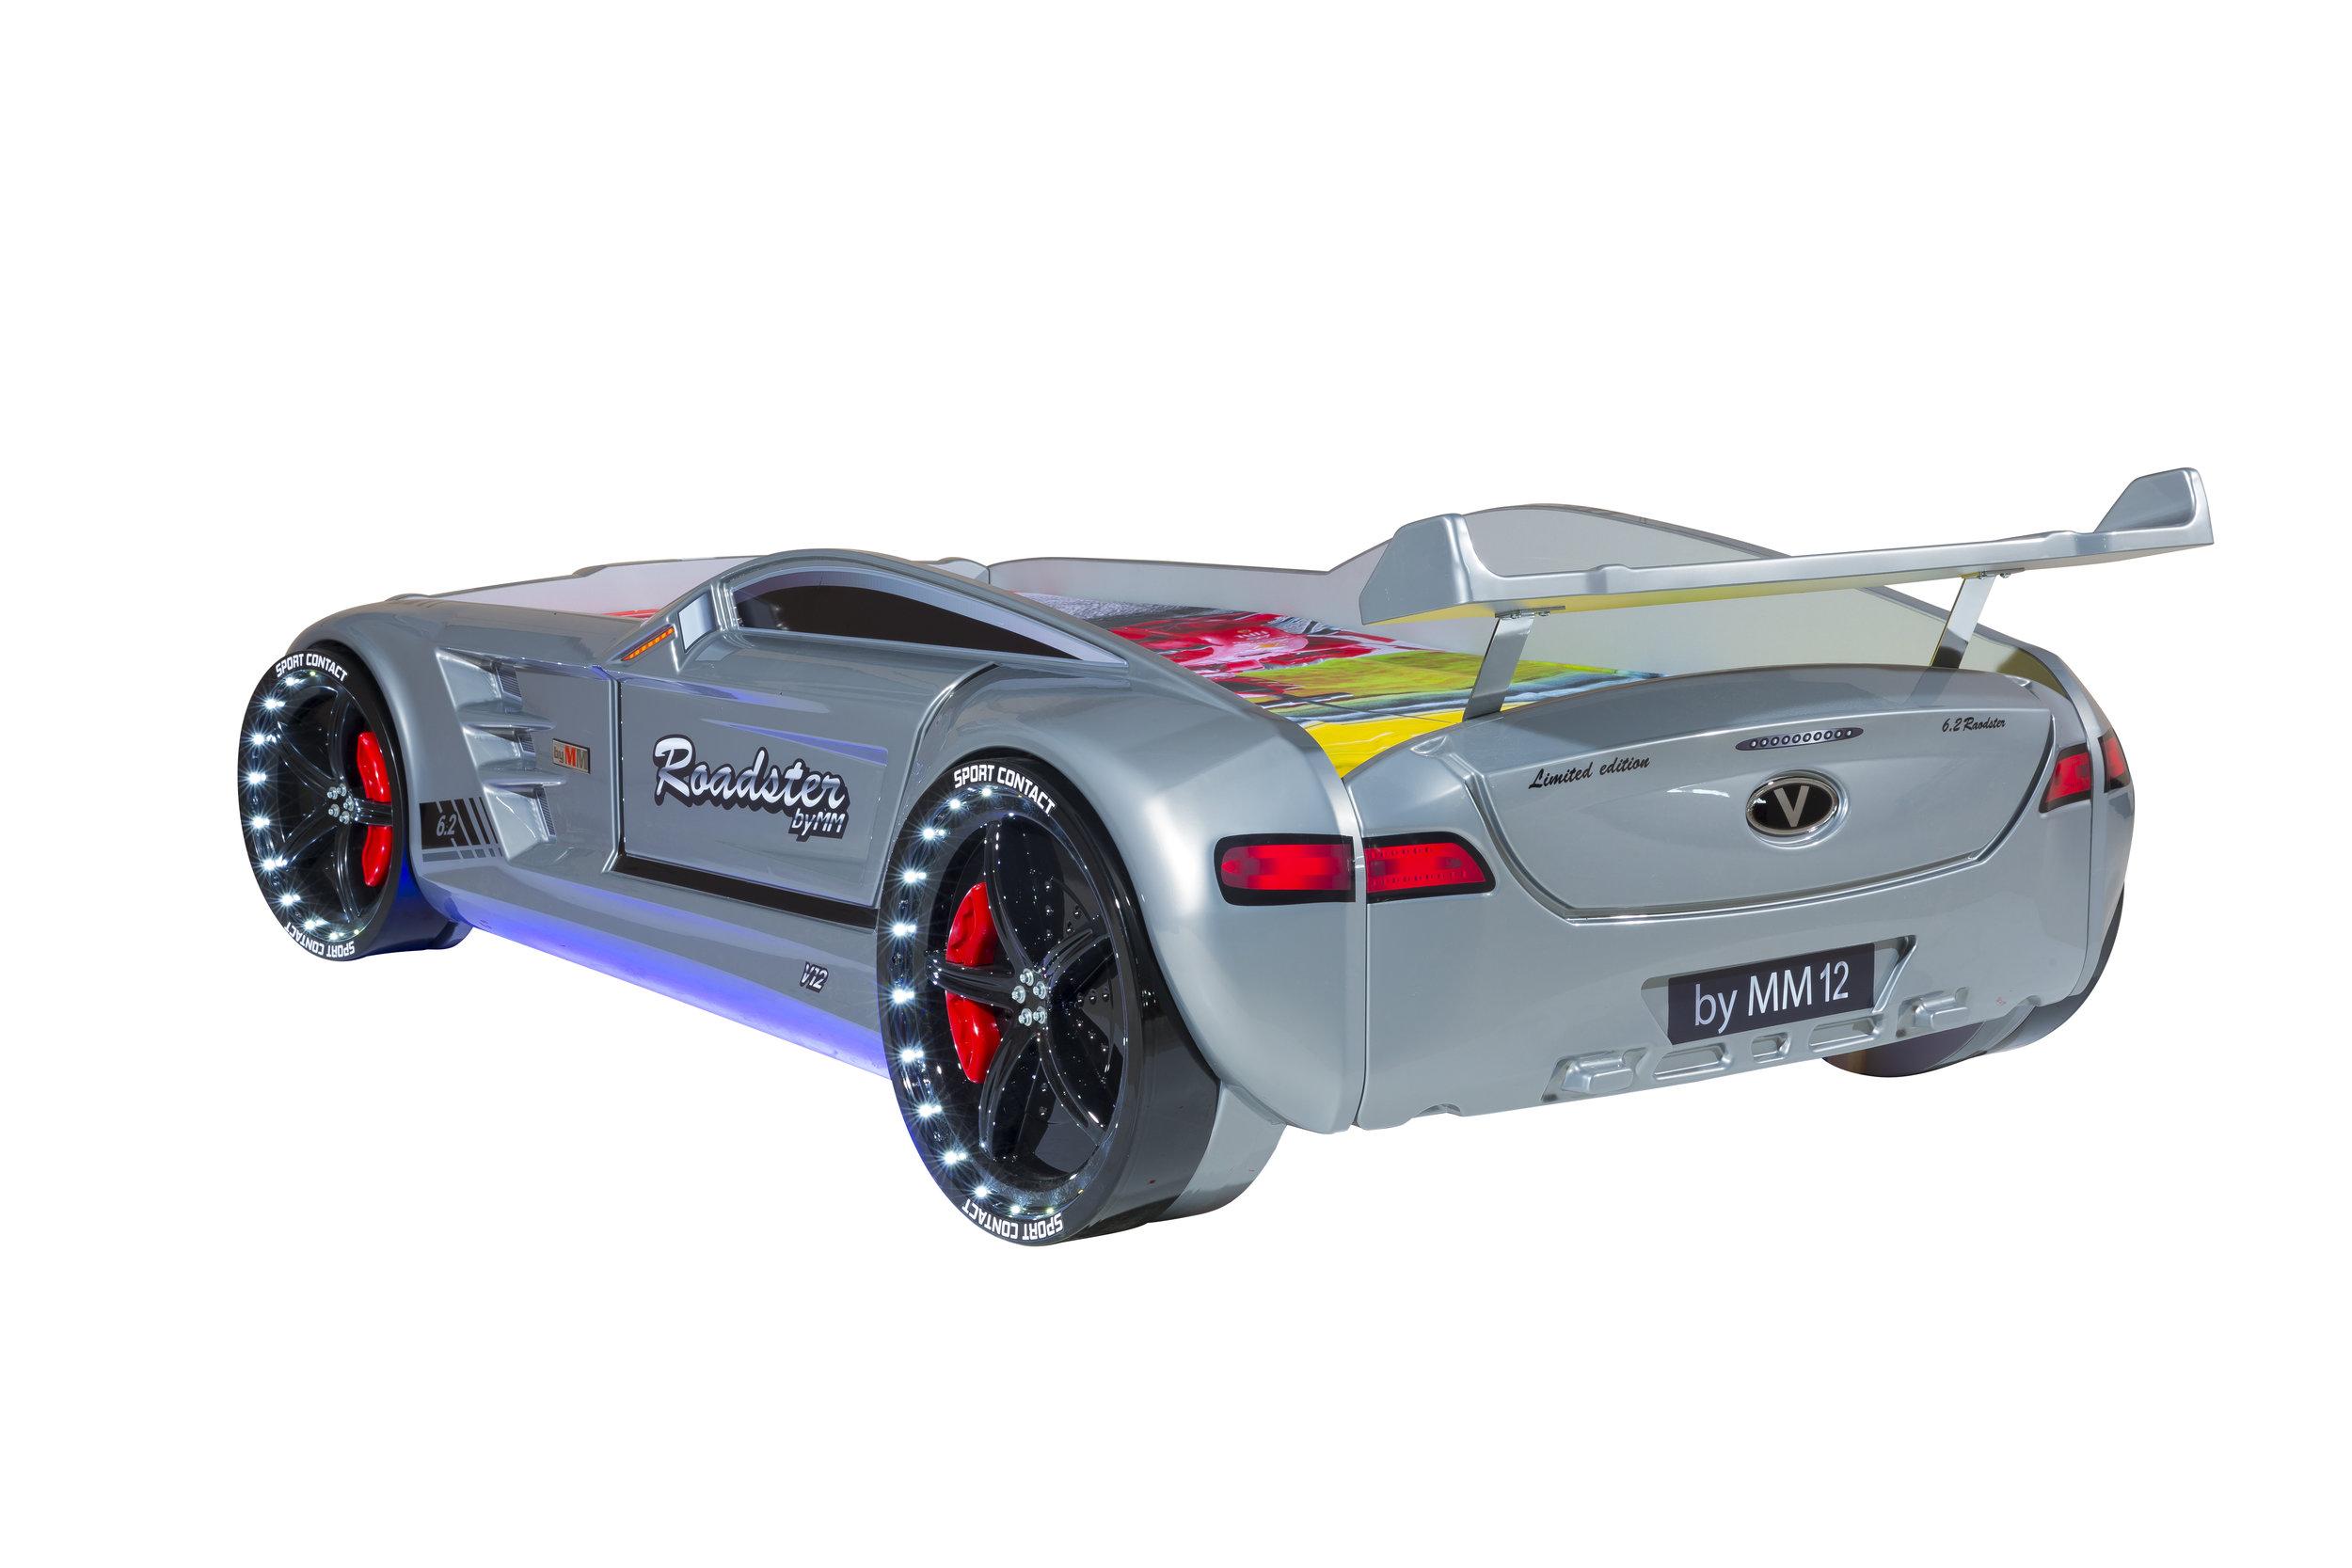 Roadstar Gri Lüks Versiyon (4).jpg